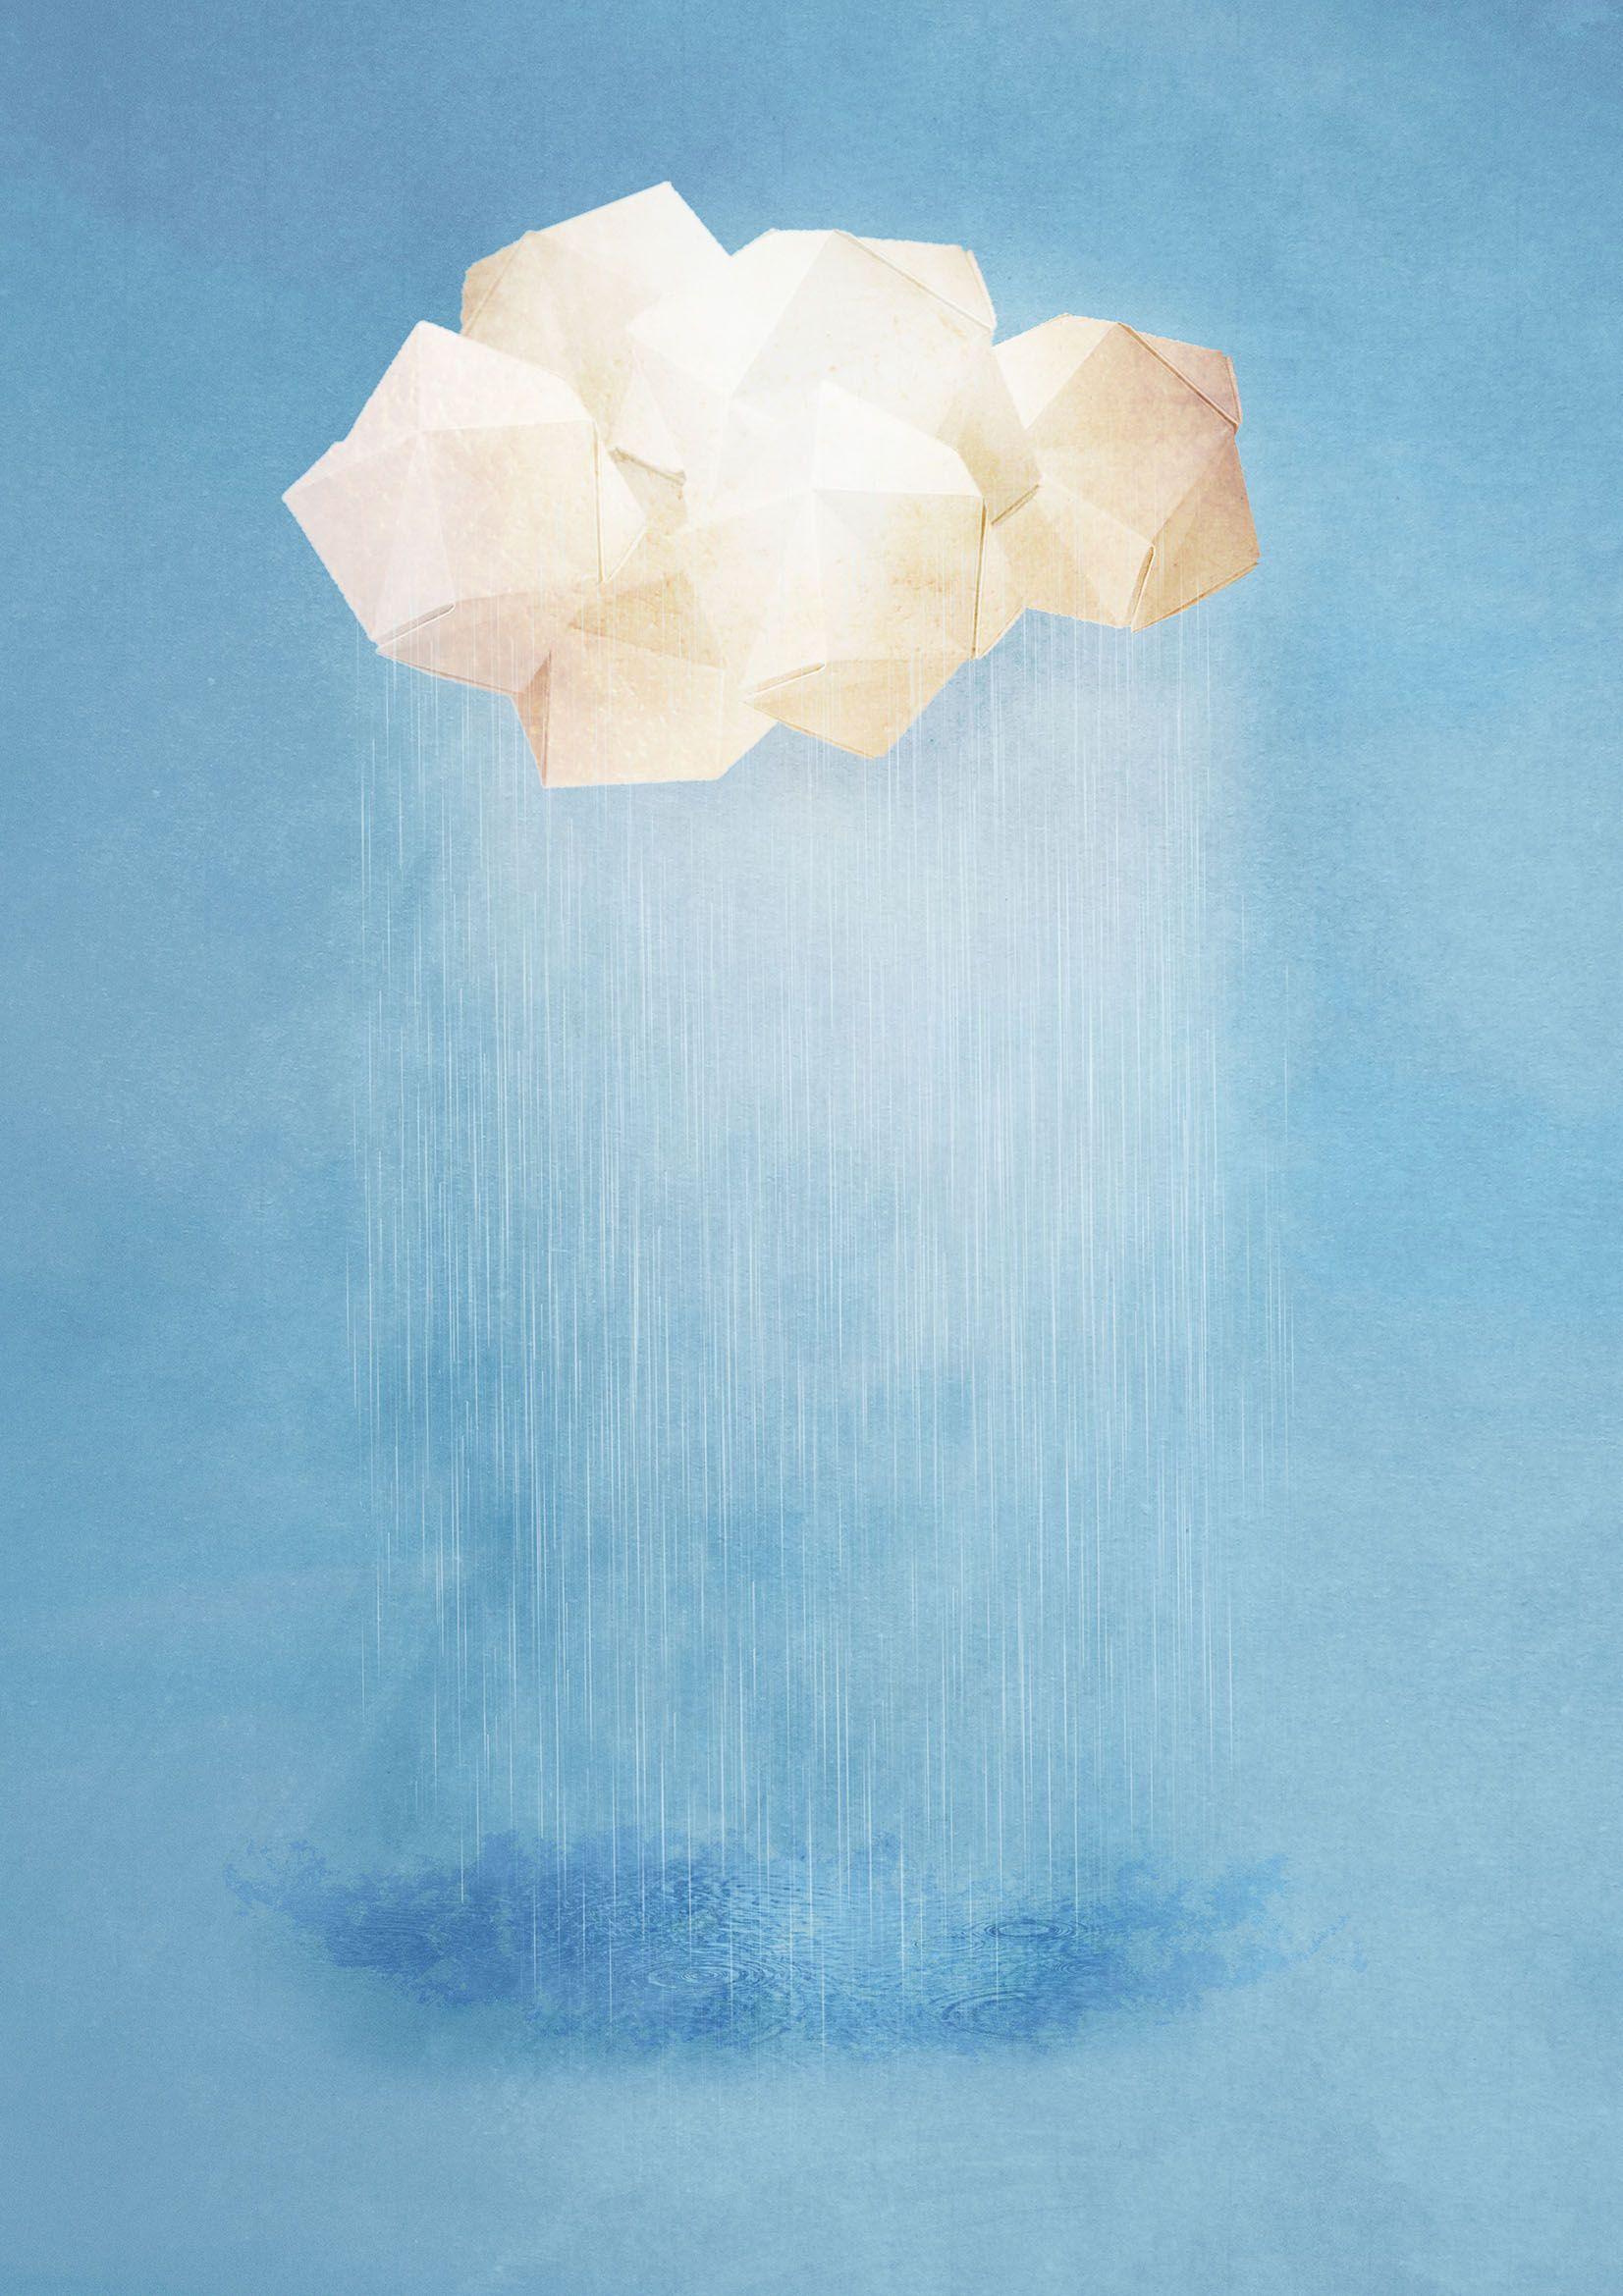 illustration of origami cloud